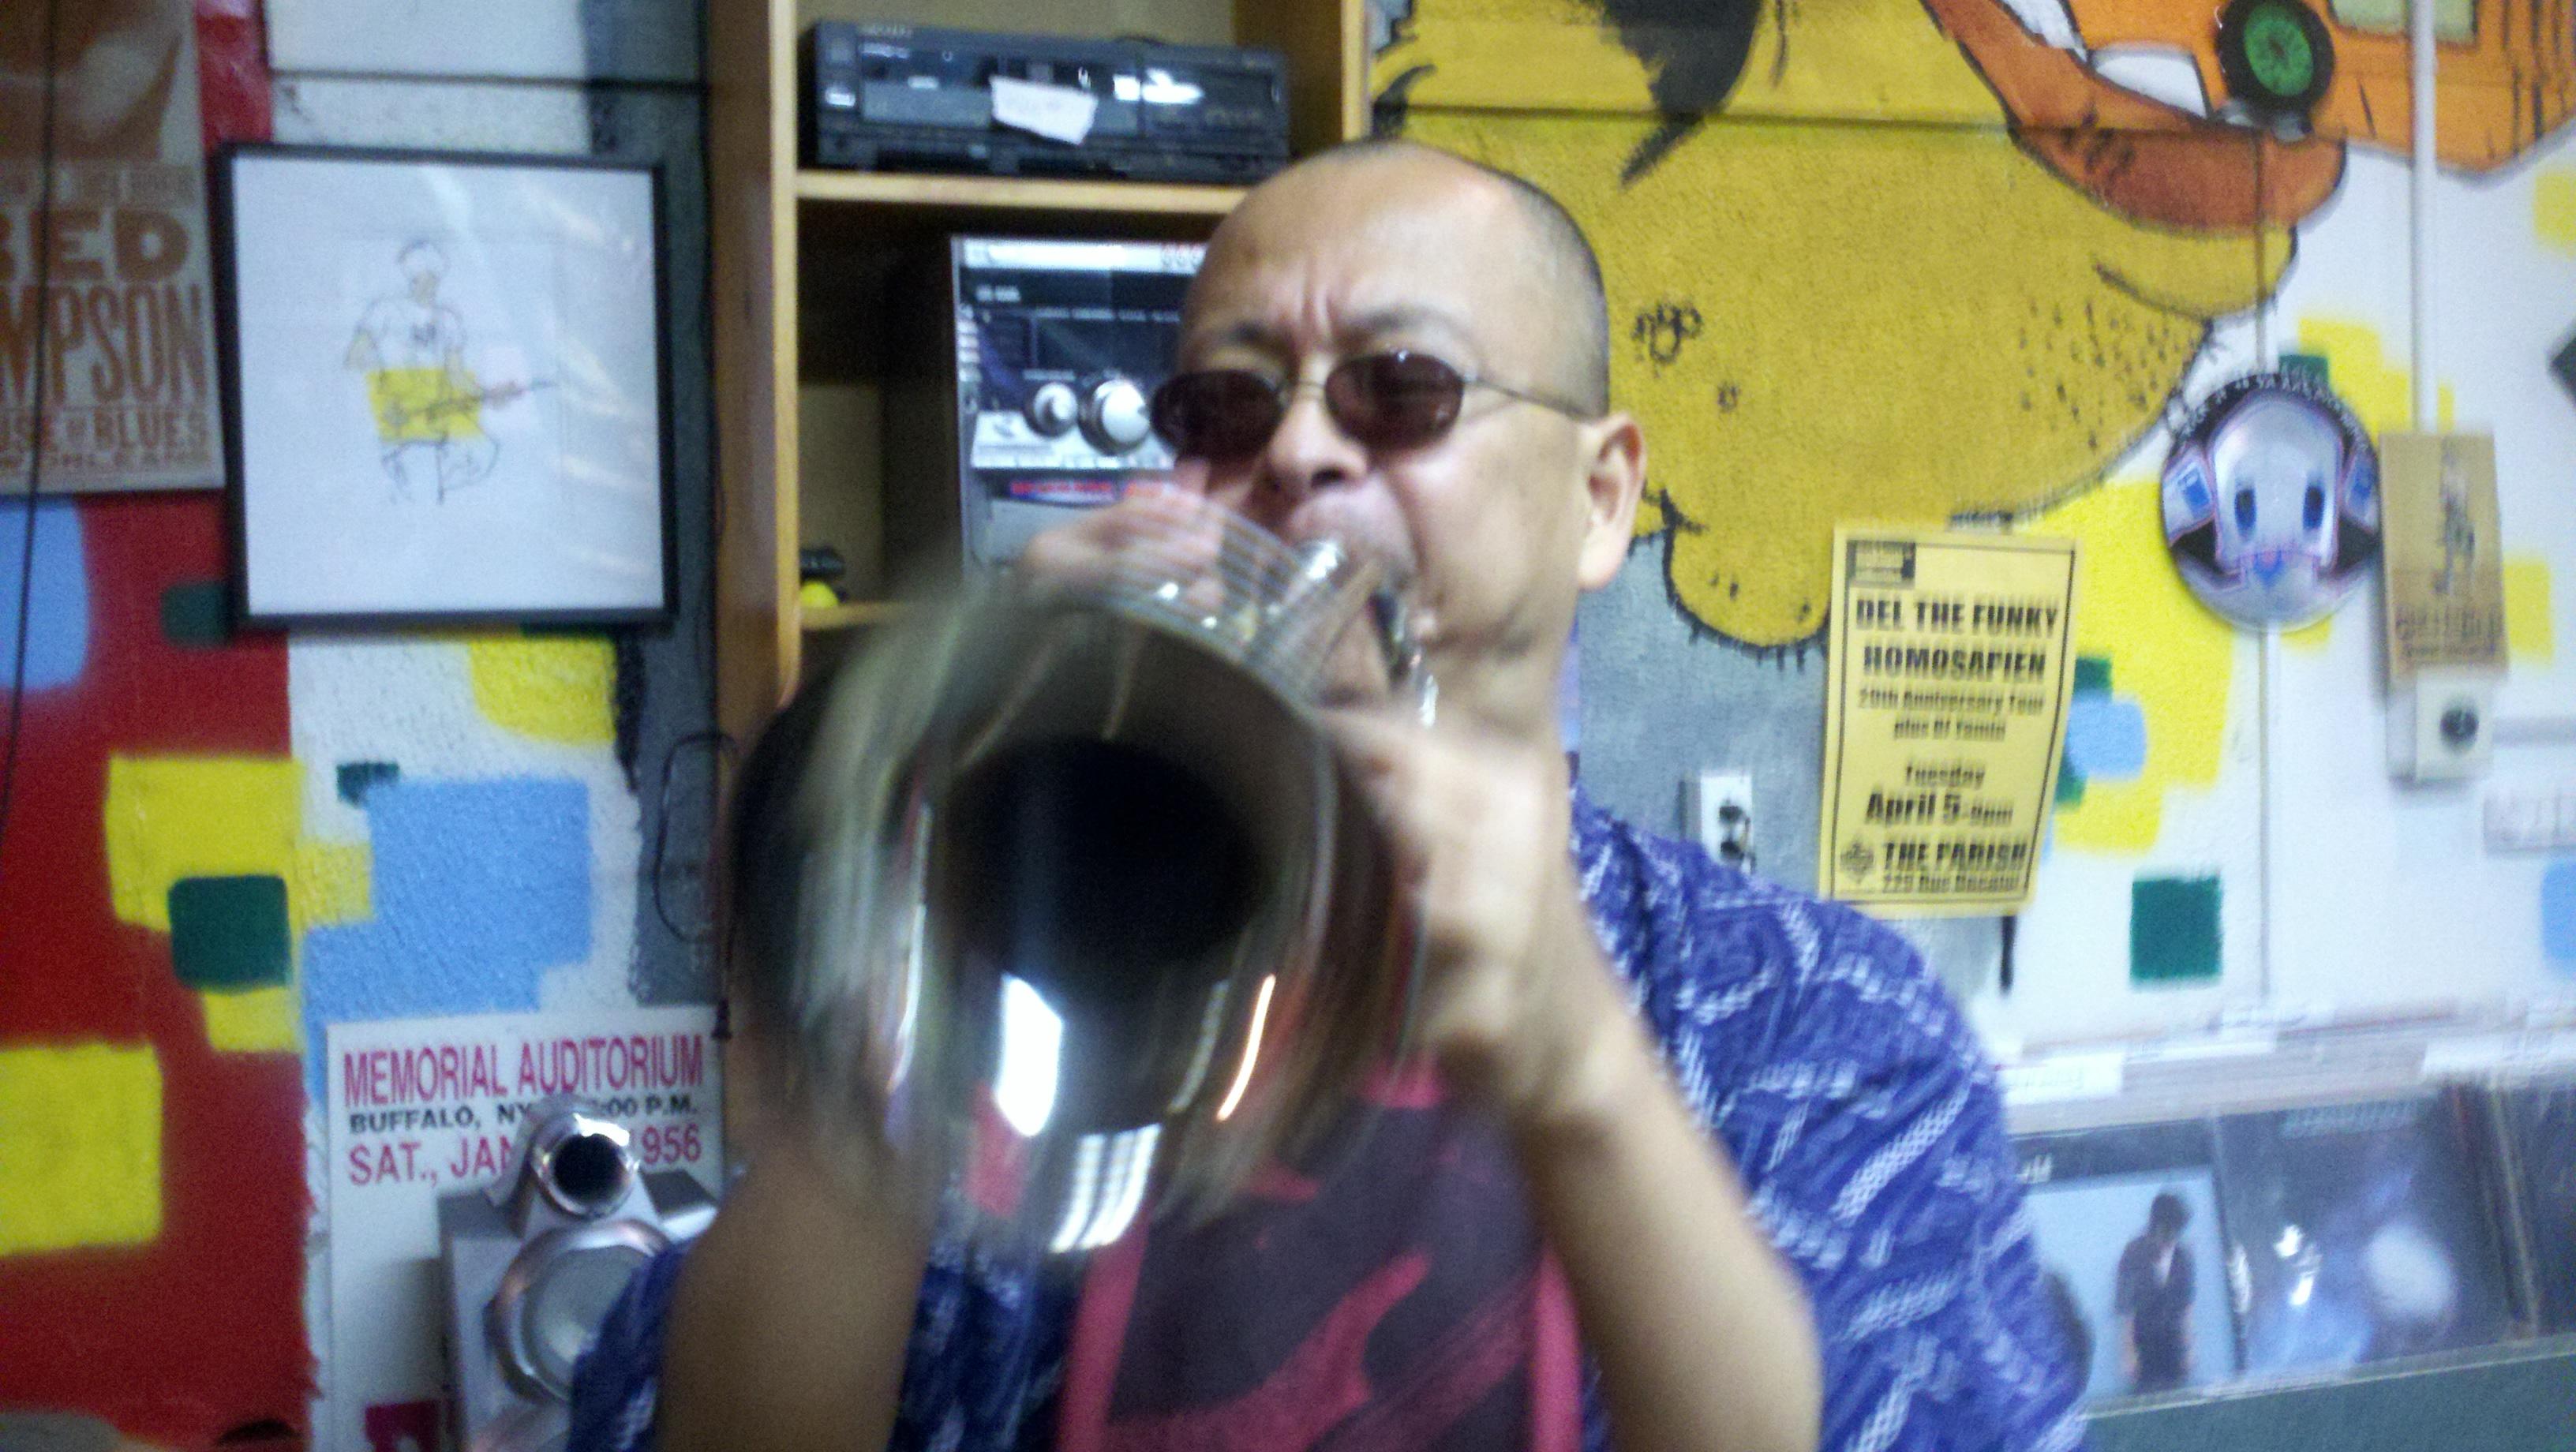 Keiichi - Euclid Records, NOLA 2011